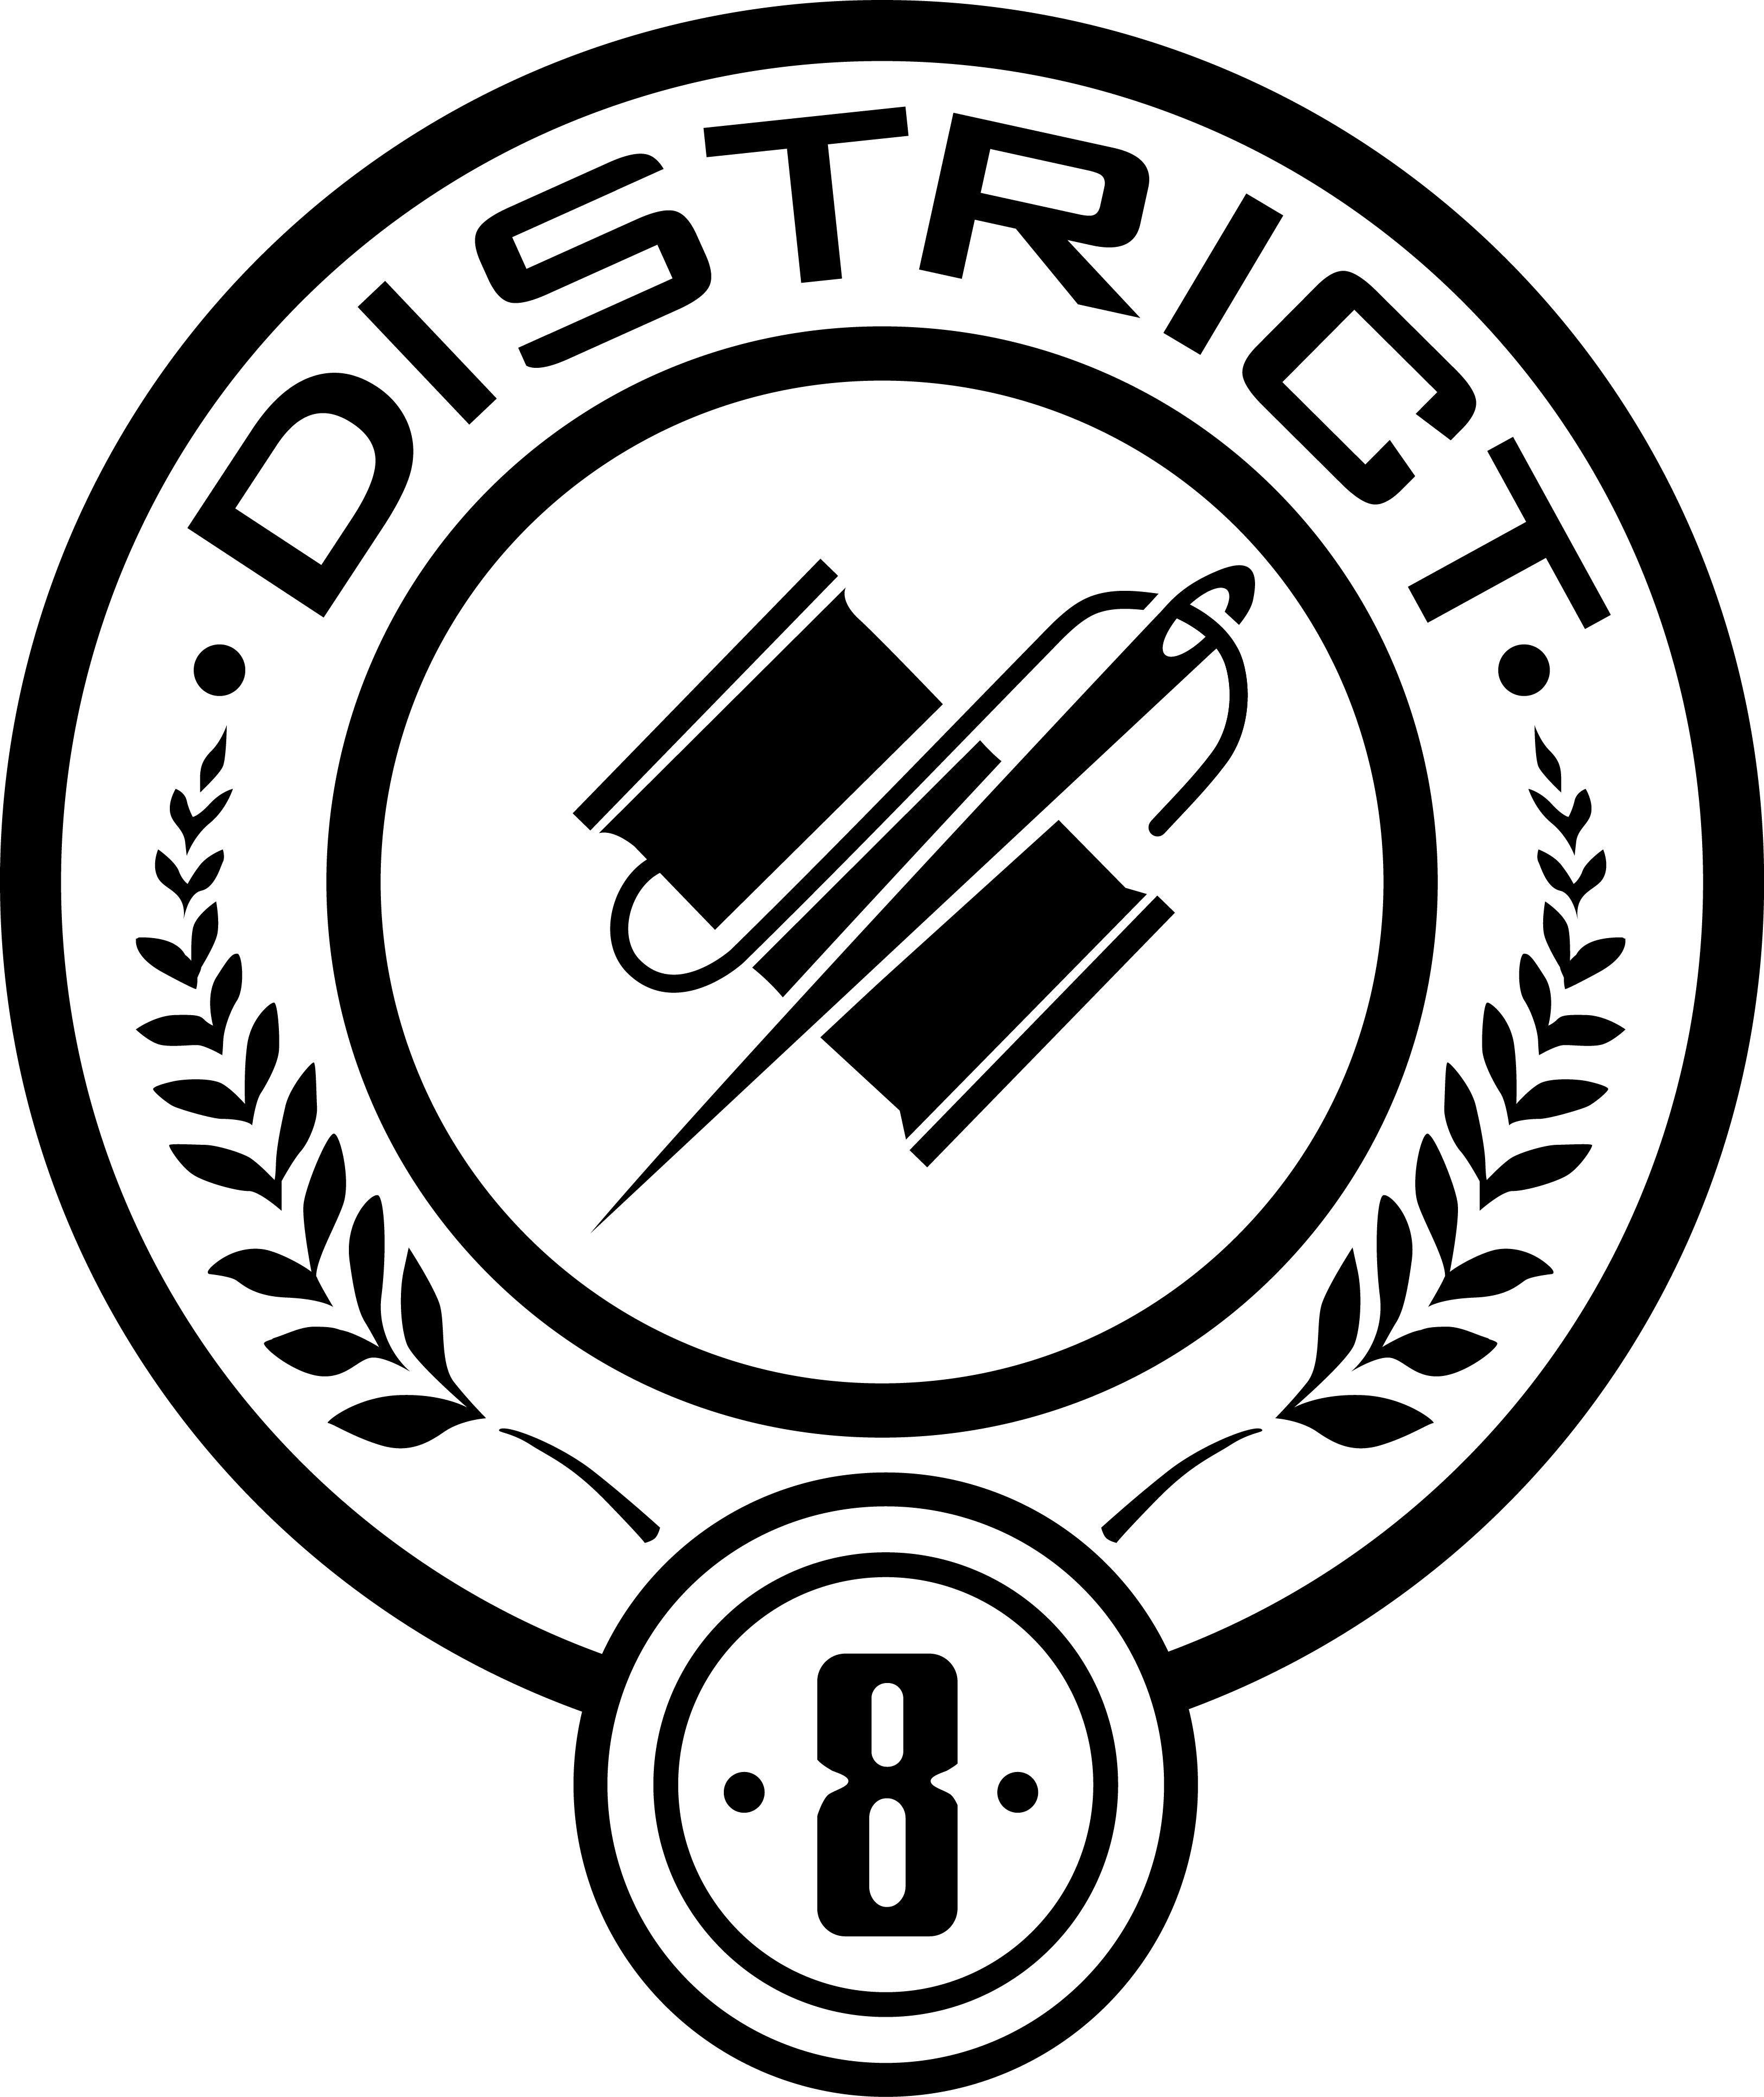 District 7 Seal by CaptainIggy on DeviantArt